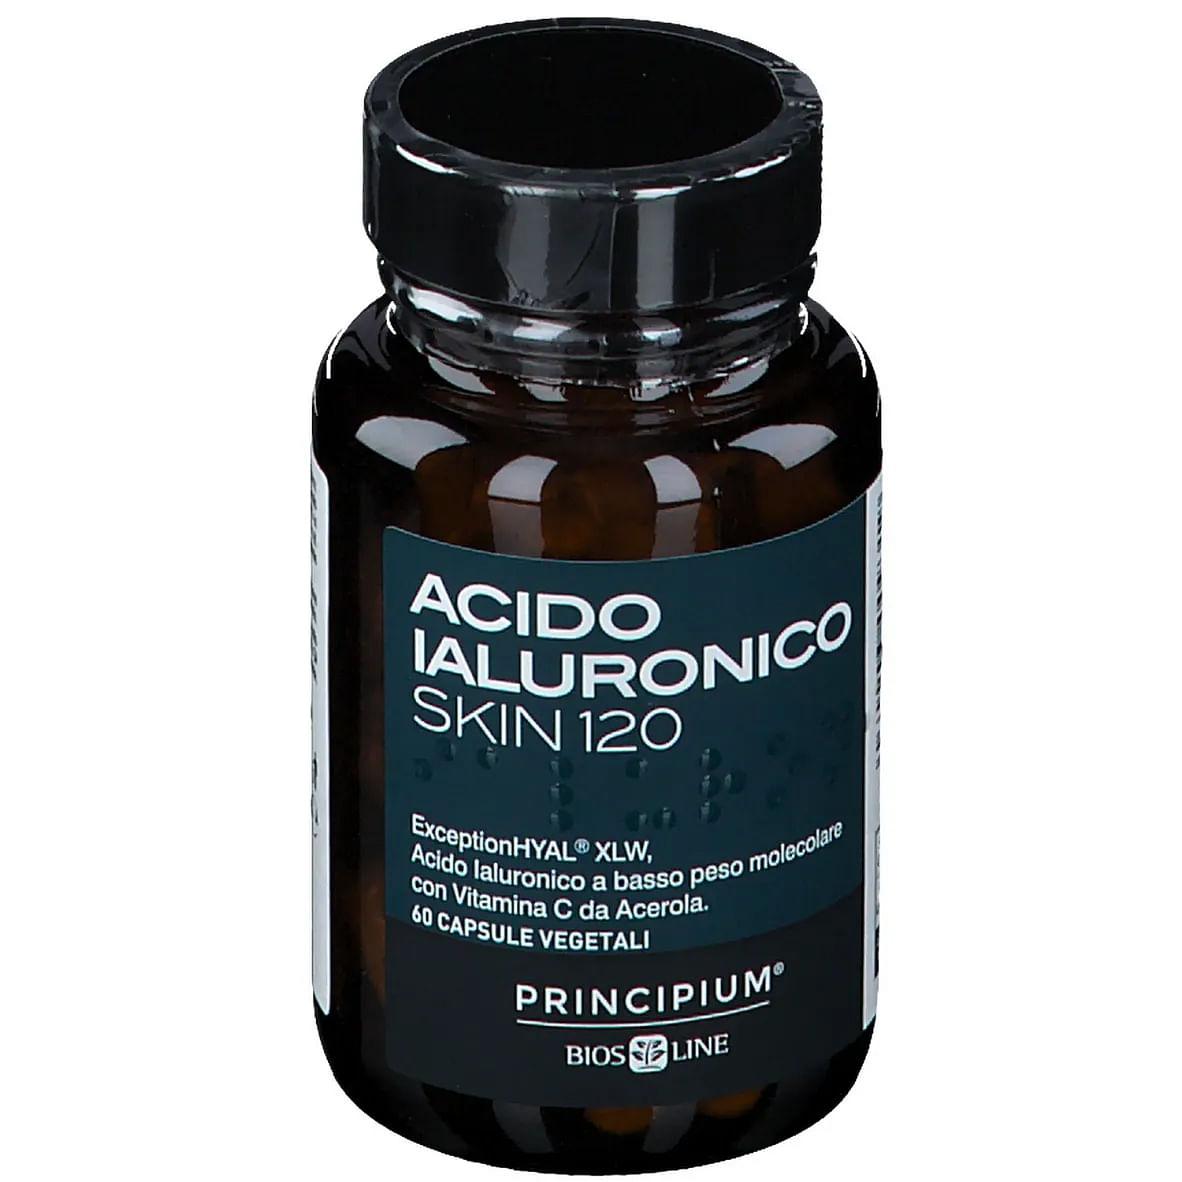 bios line principium acido ialuronico skin 120 60 capsule vegetali